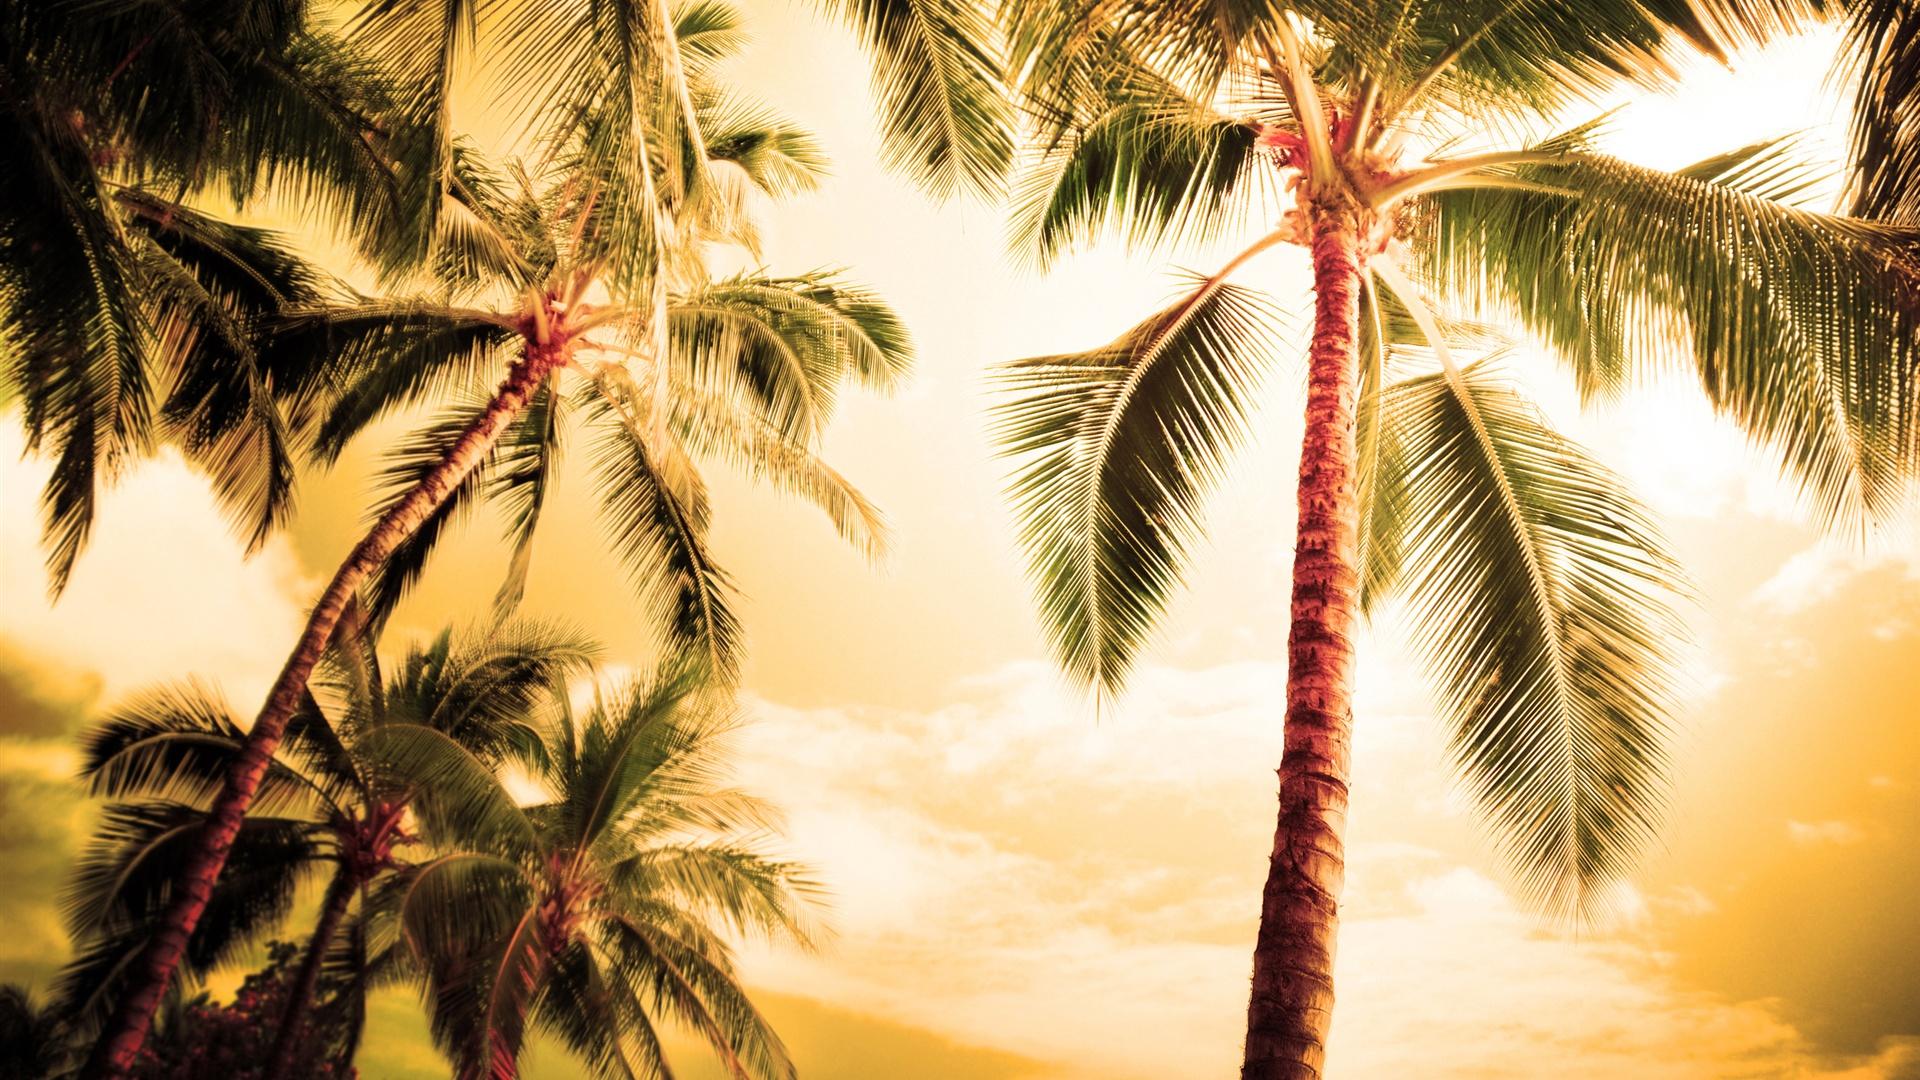 Tropics Palm Trees Sun Beach 4k Hd Desktop Wallpaper For: 壁紙 ハワイ、暑い夏には、ヤシの木 2560x1600 HD 無料のデスクトップの背景, 画像